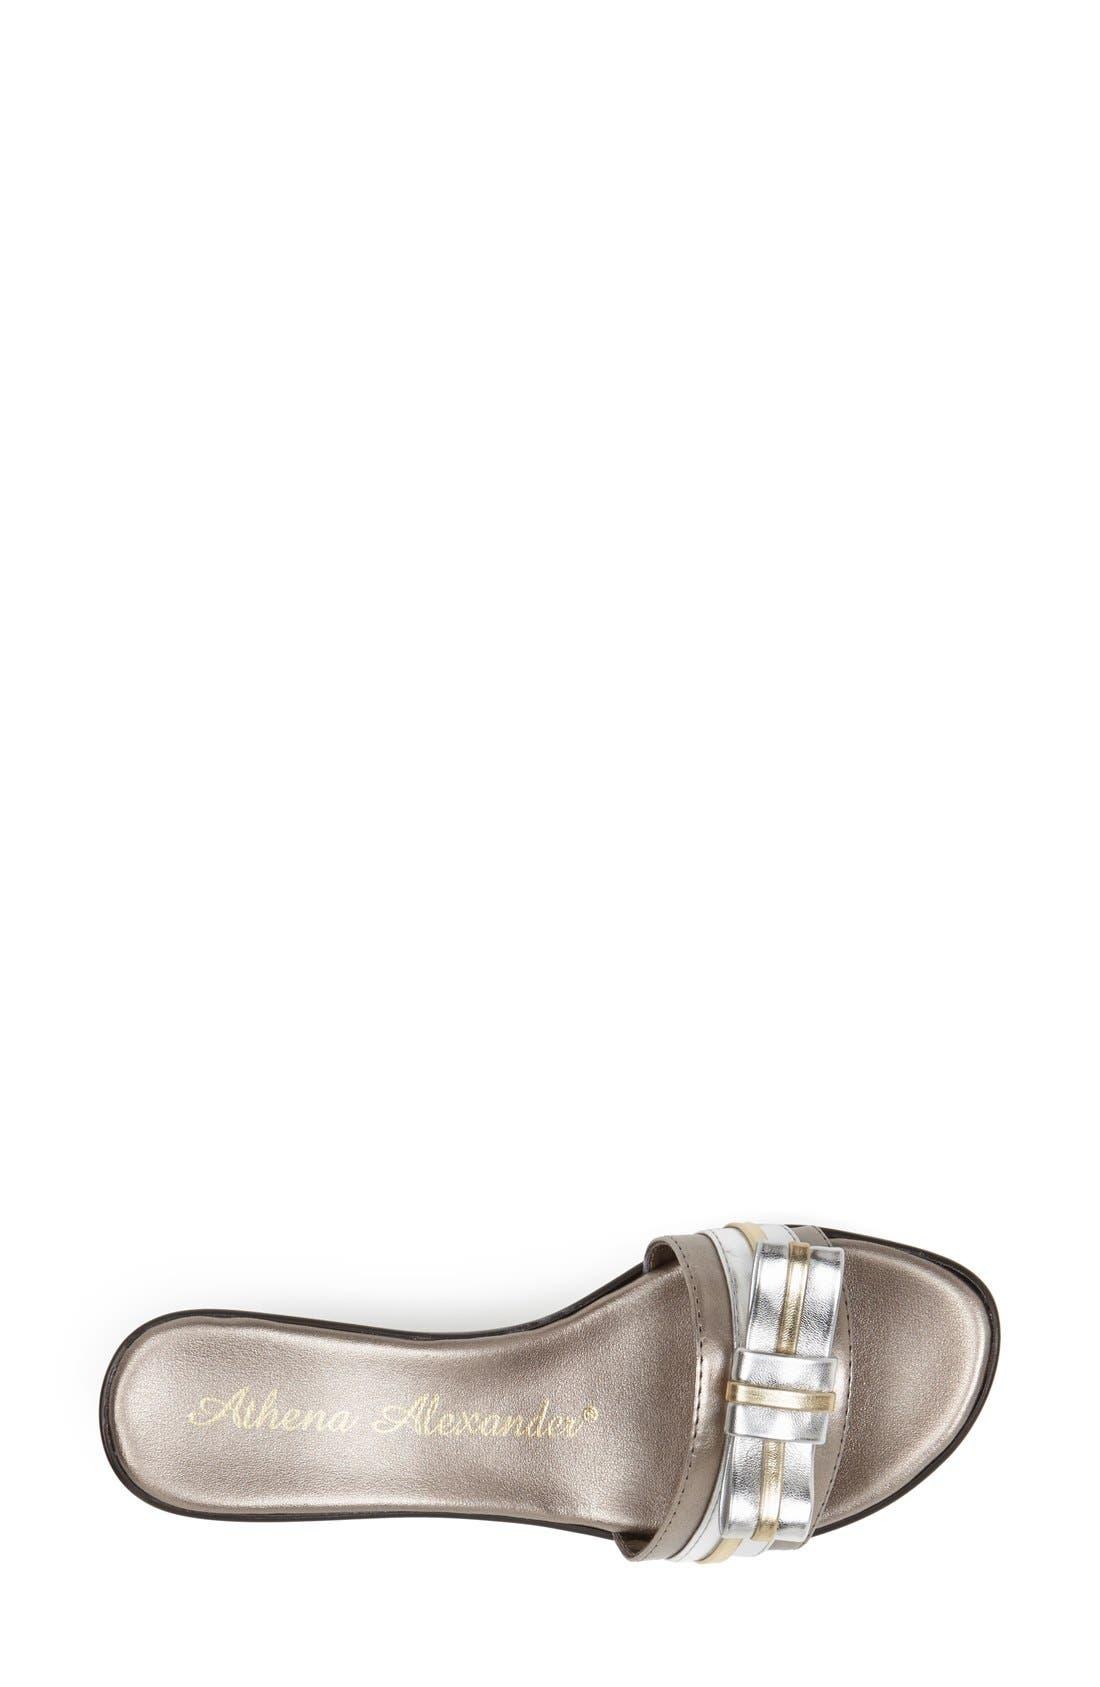 Alternate Image 3  - Athena Alexander 'Salty' Sandal (Women)